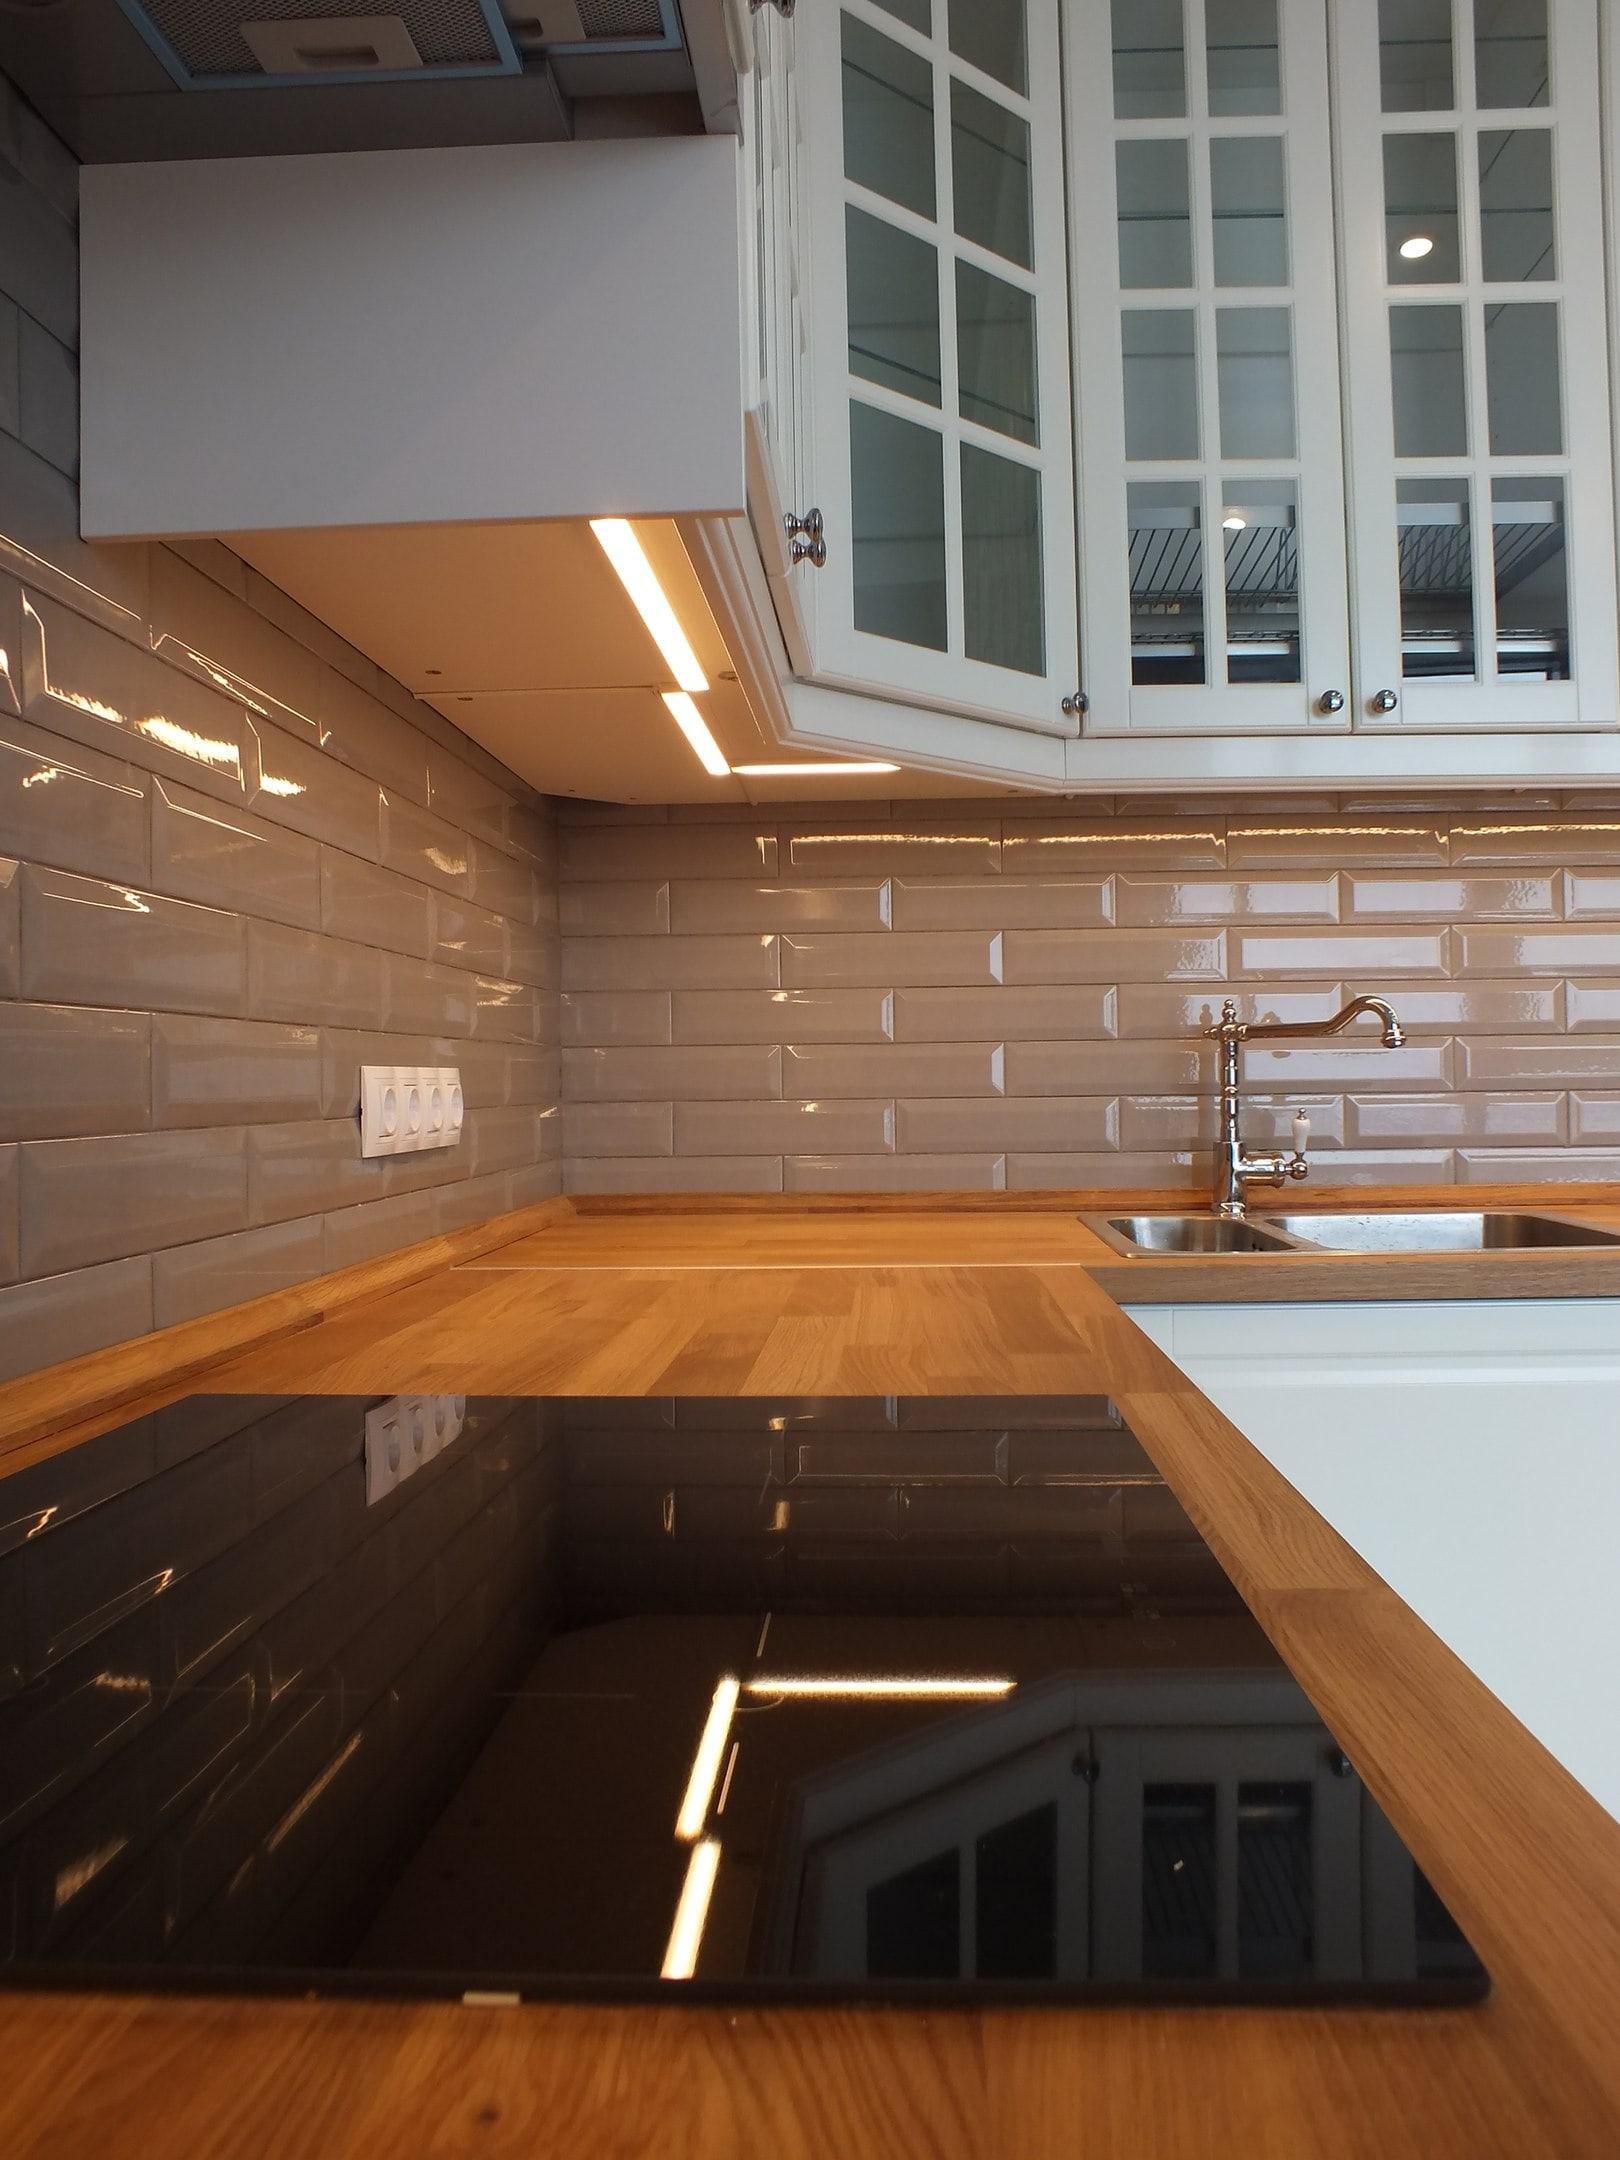 ikea kitchen studio from crossartstudio. Black Bedroom Furniture Sets. Home Design Ideas